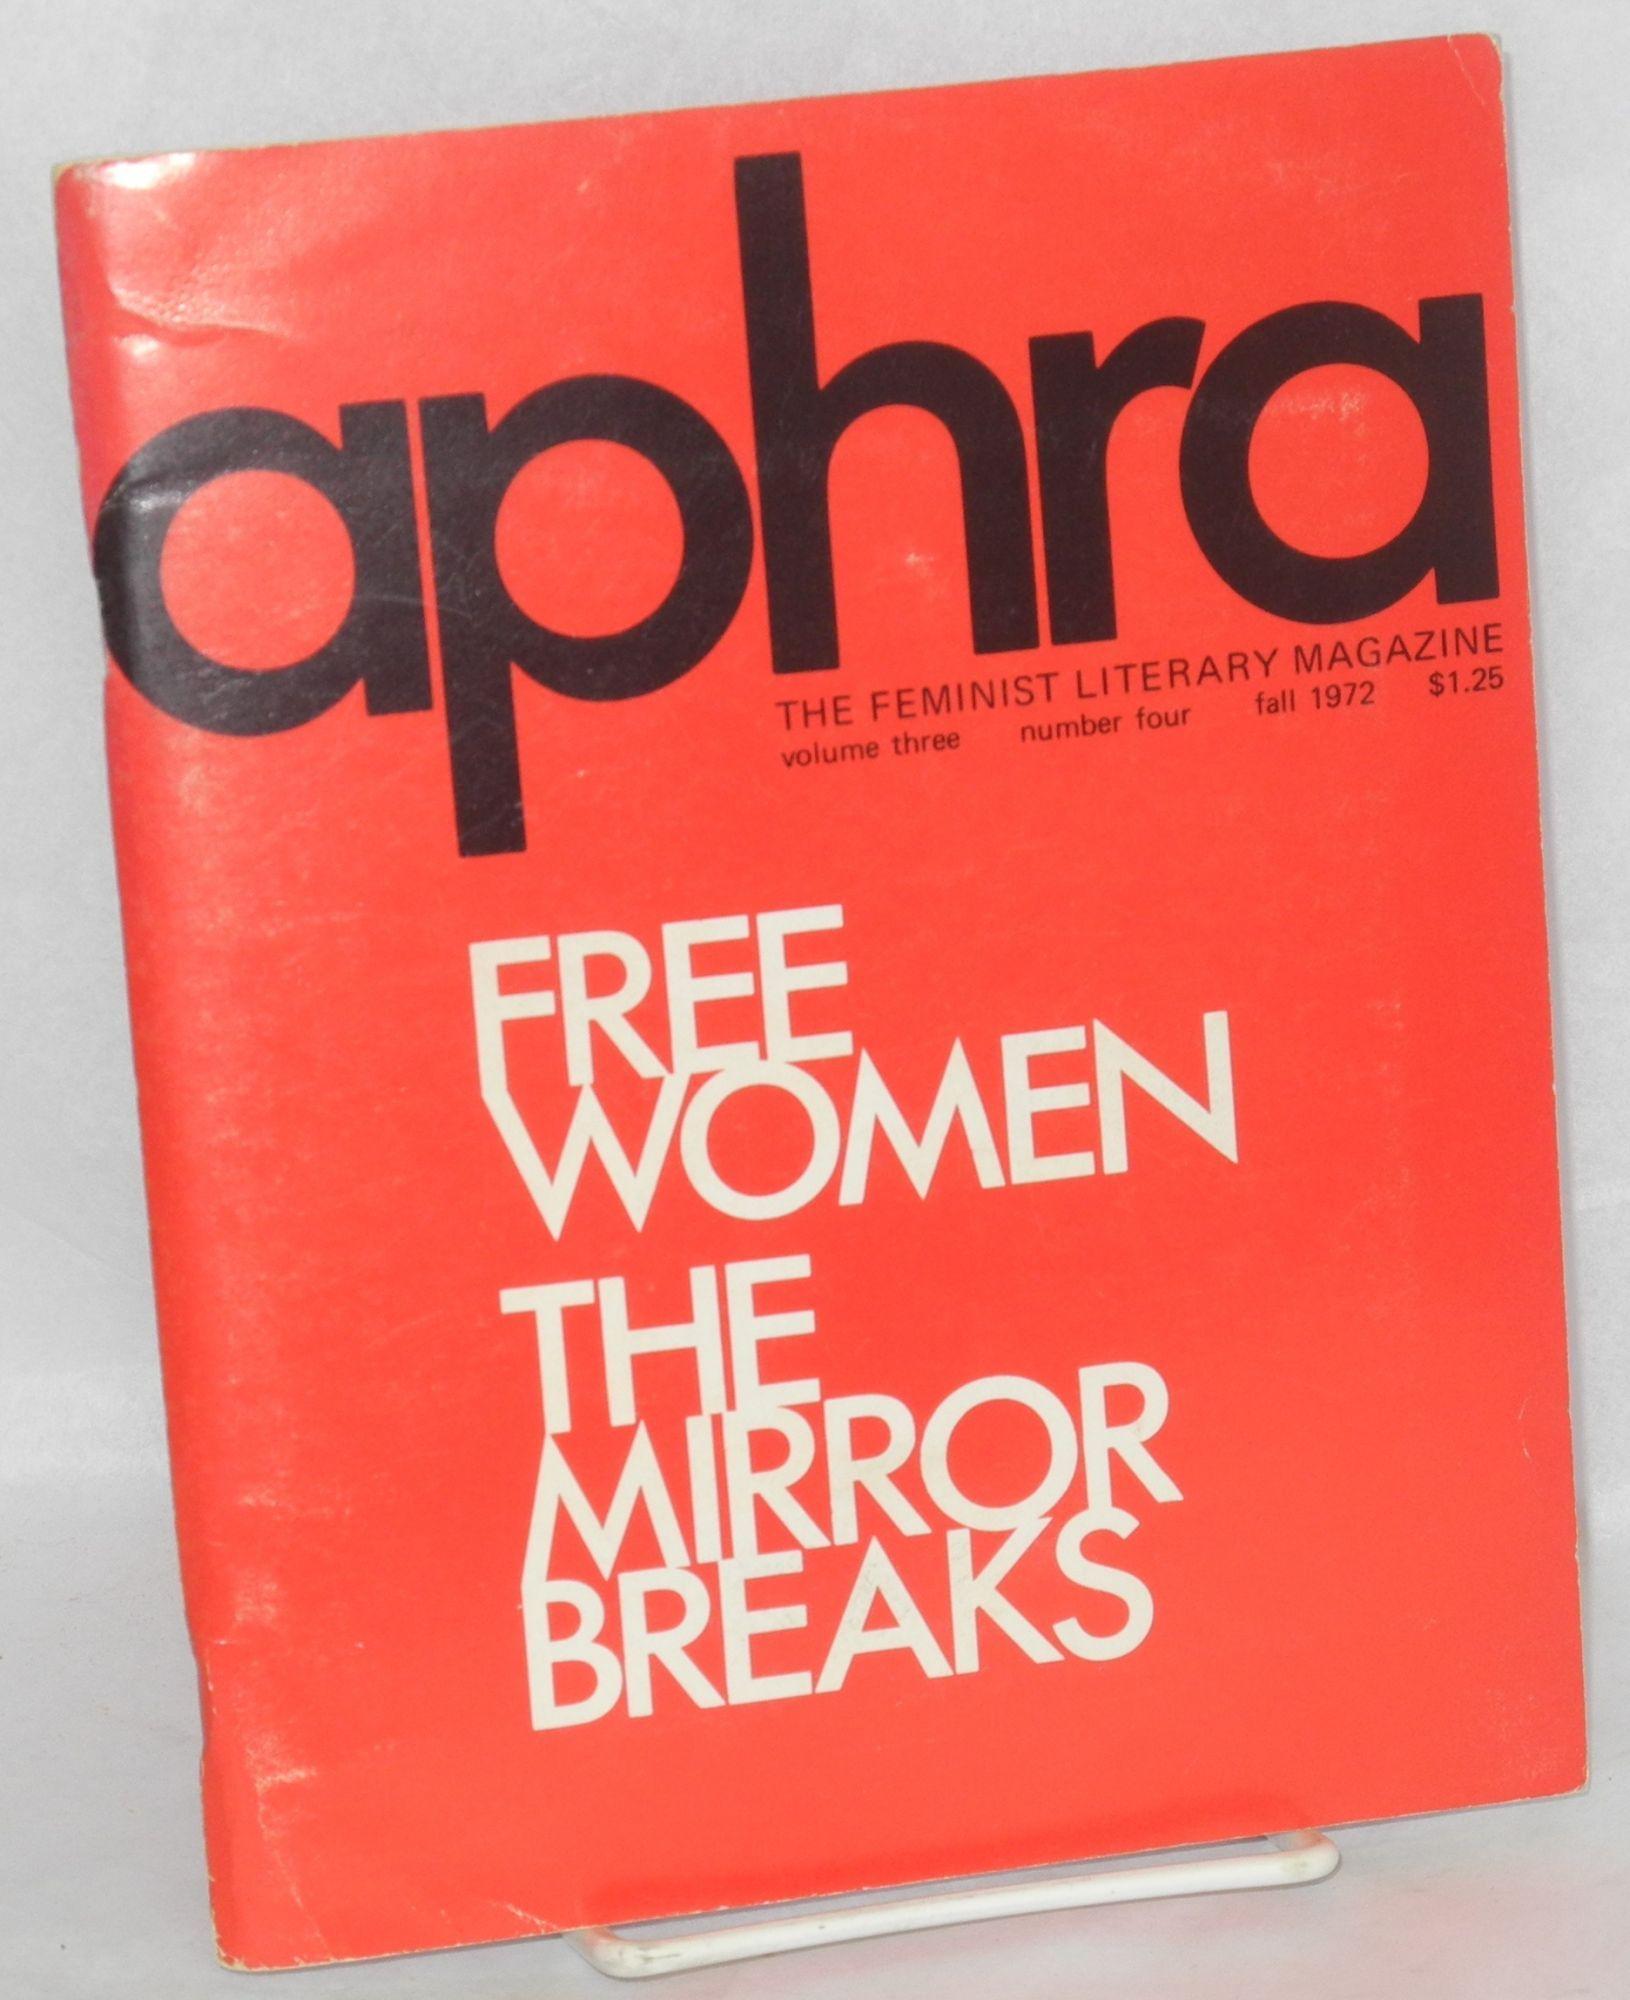 Aphra The Feminist Literary Magazine Volume 3 No 4